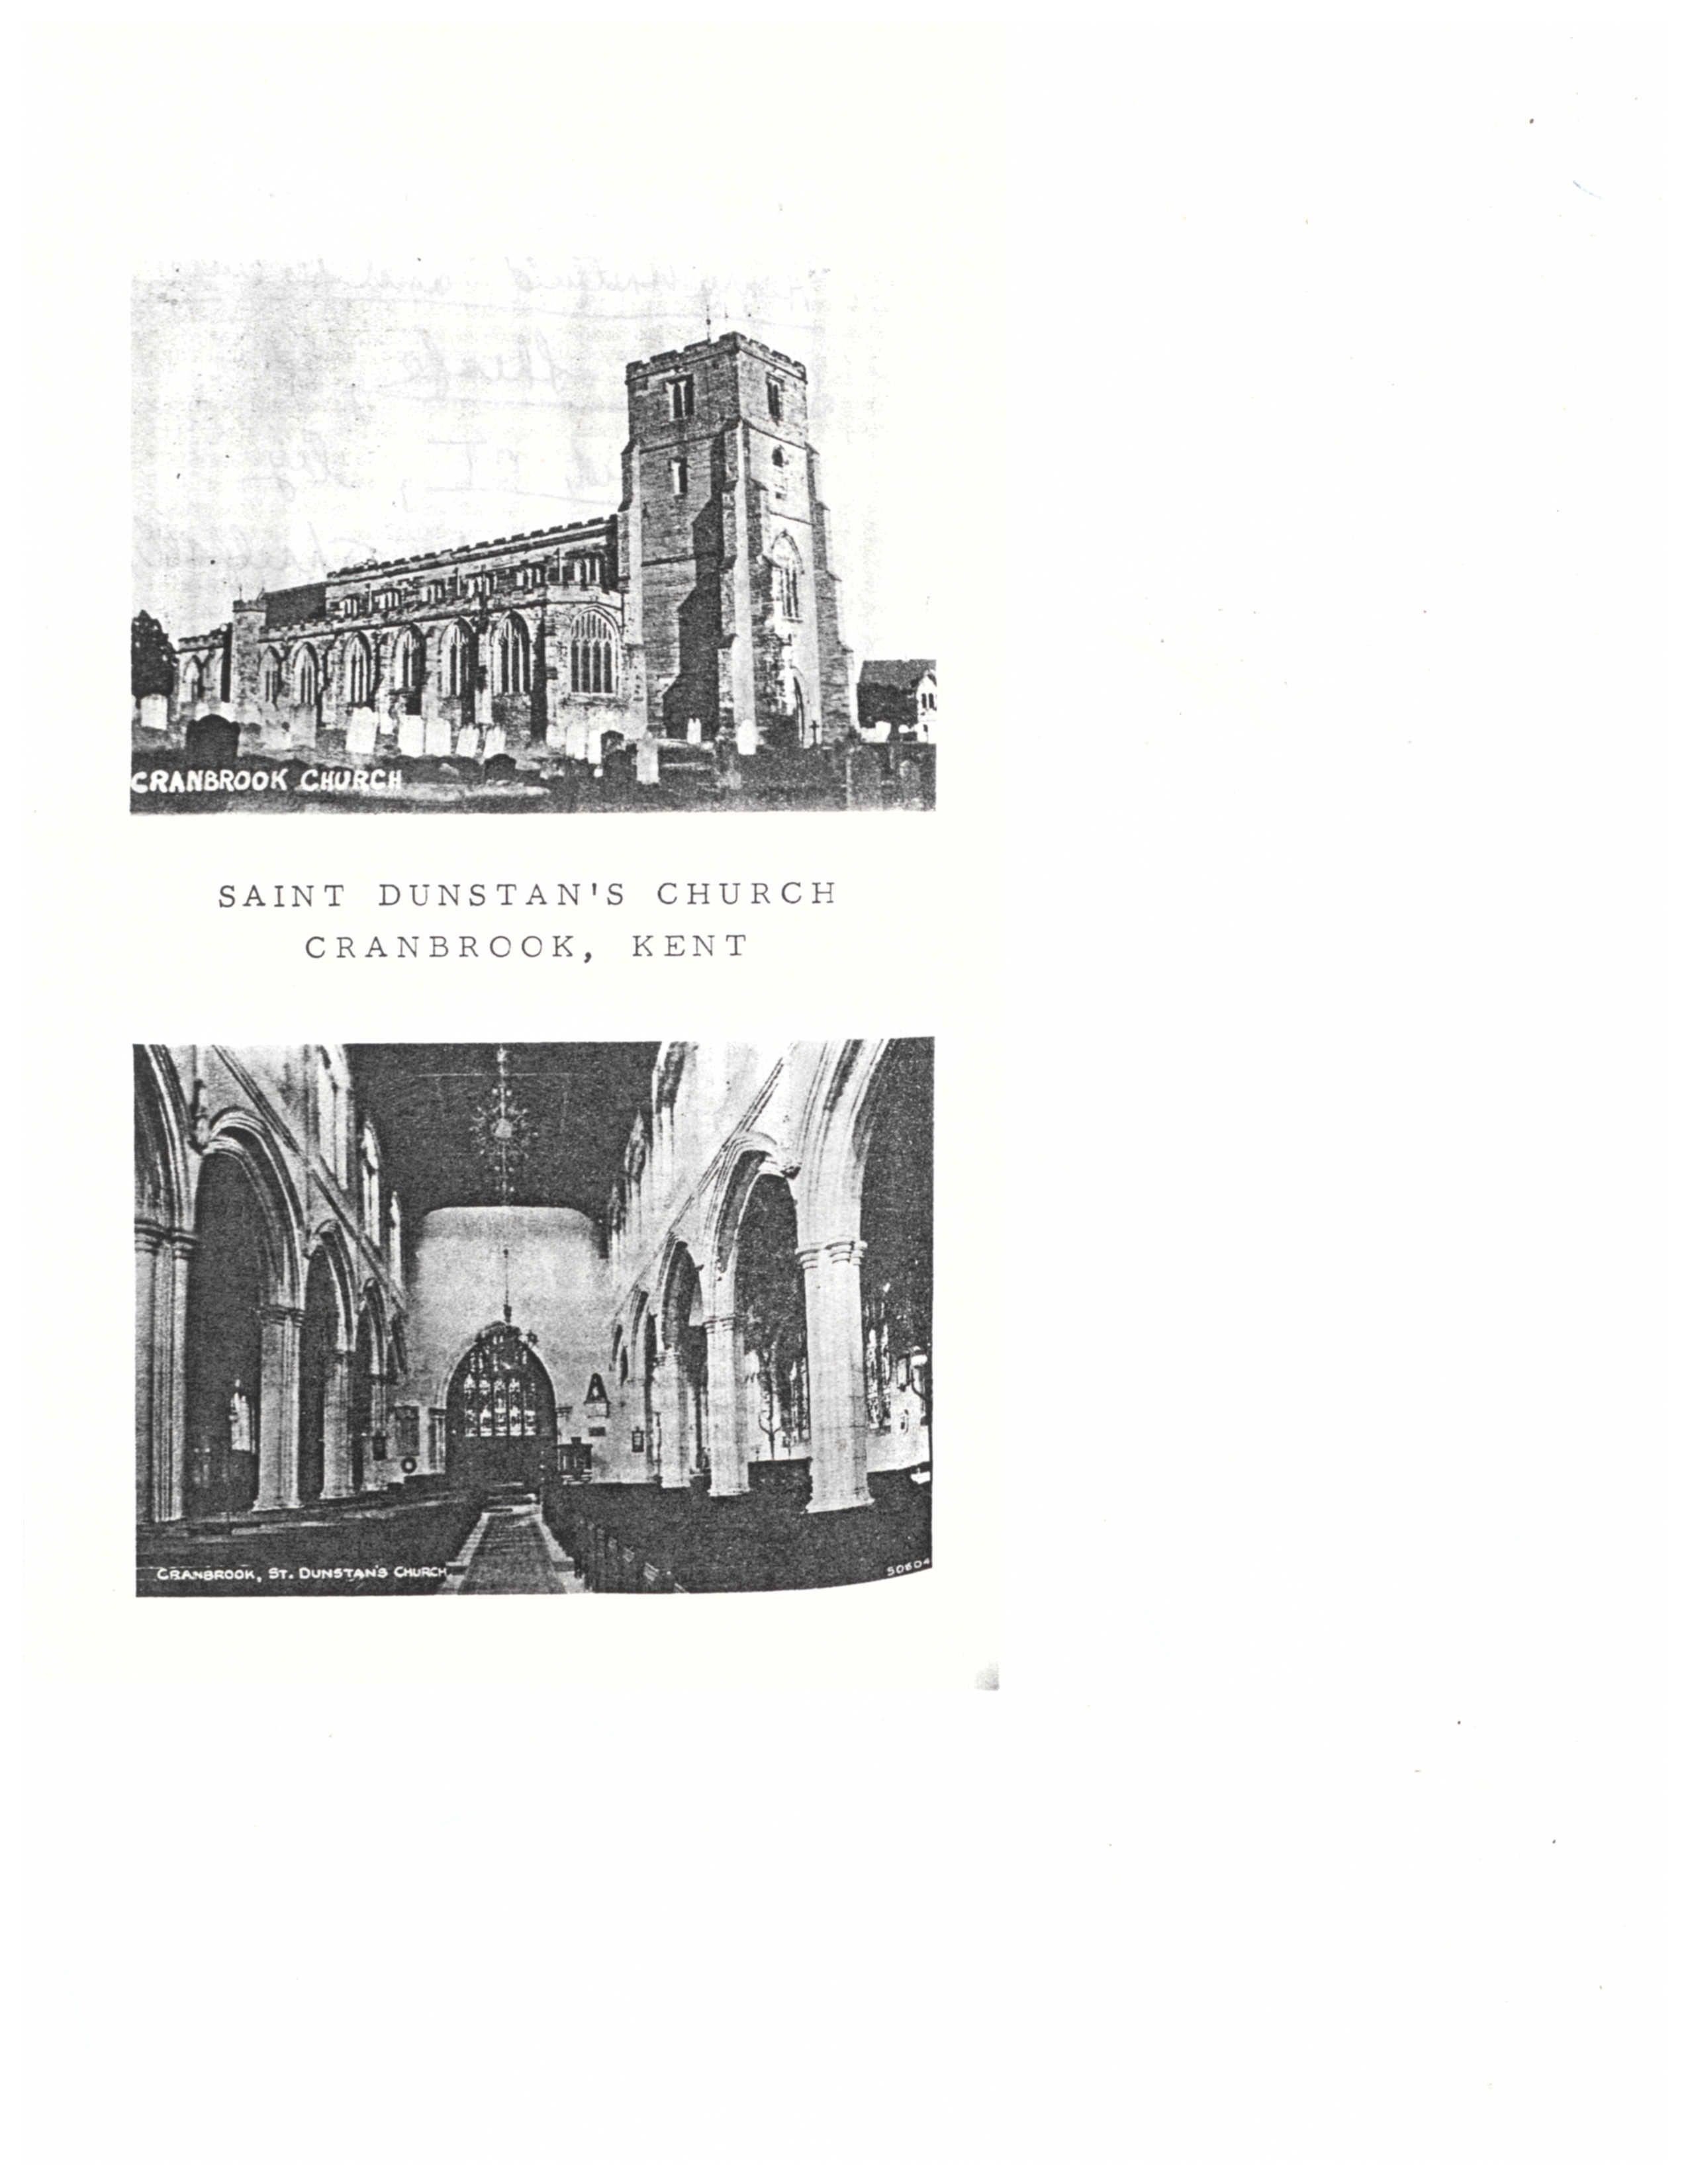 St  Dunstans's Church, Cranbrook, England | Genealogy